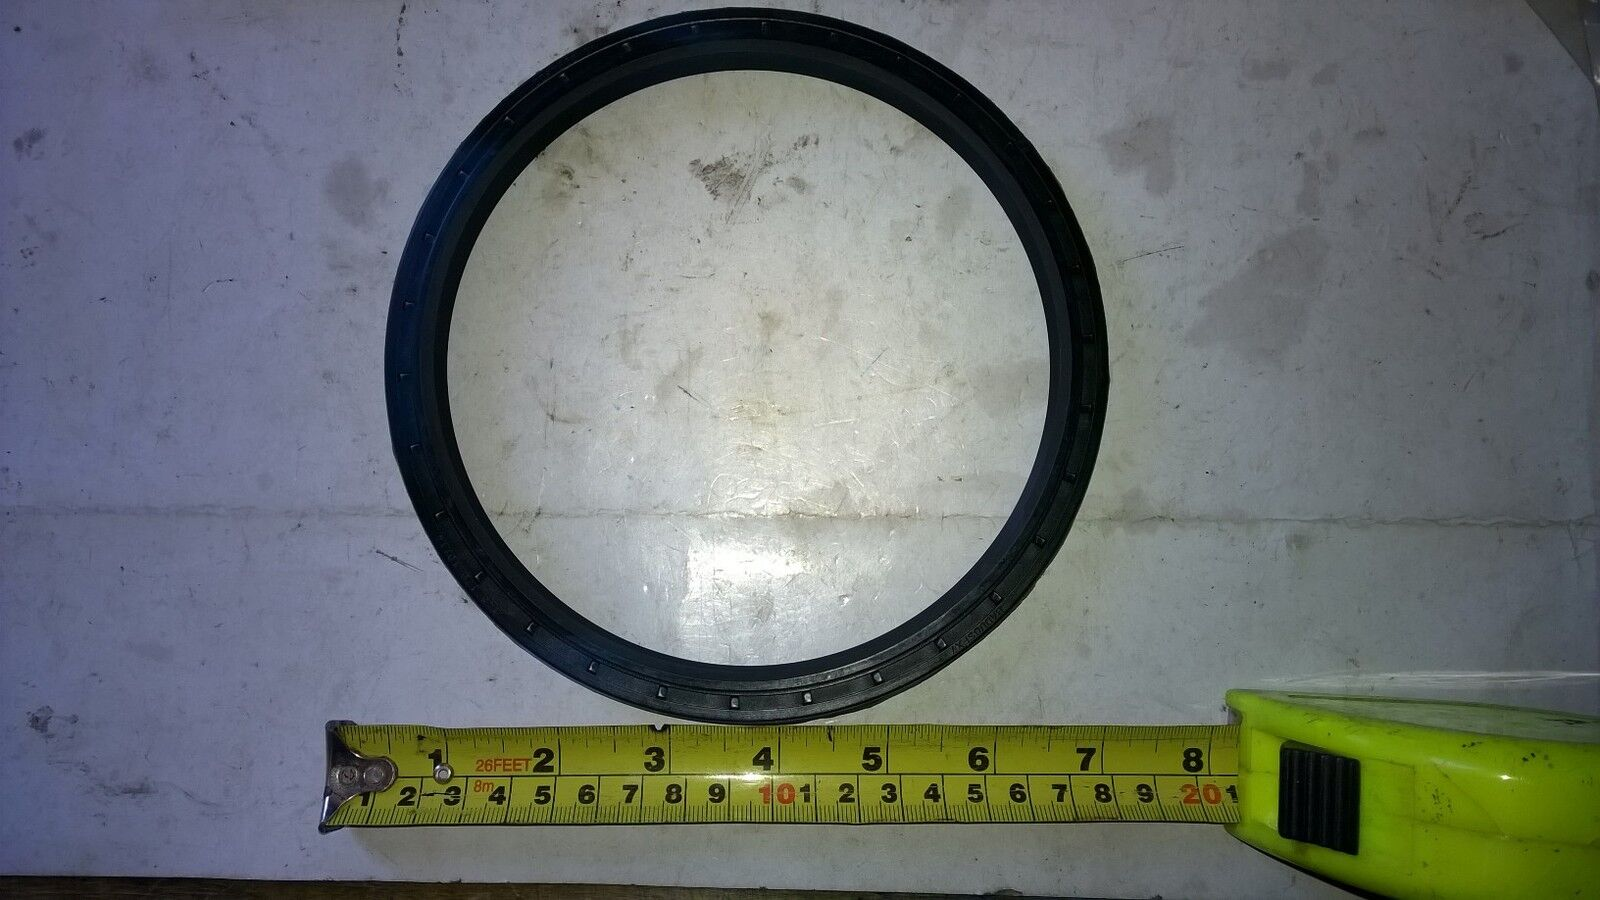 CASE INTERNATIONAL PLAIN SEAL P N 275.06.008.01 - EX ARMY RESERVE